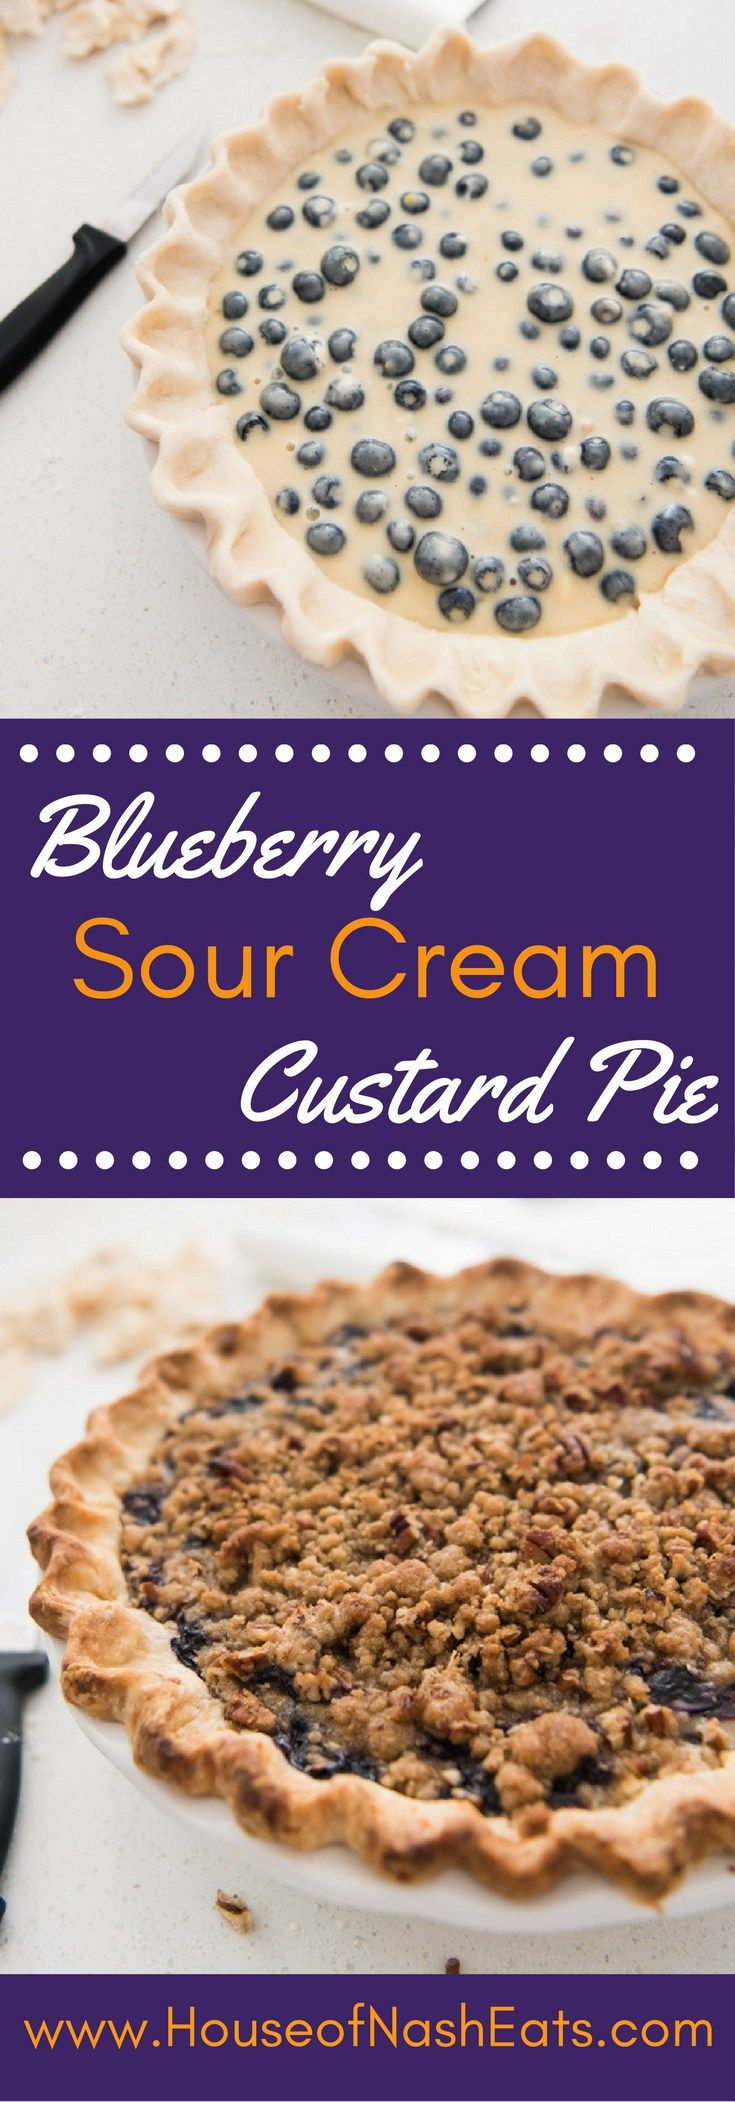 Juicy fresh blueberries, creamy sour cream custard, buttery streusel crumble…